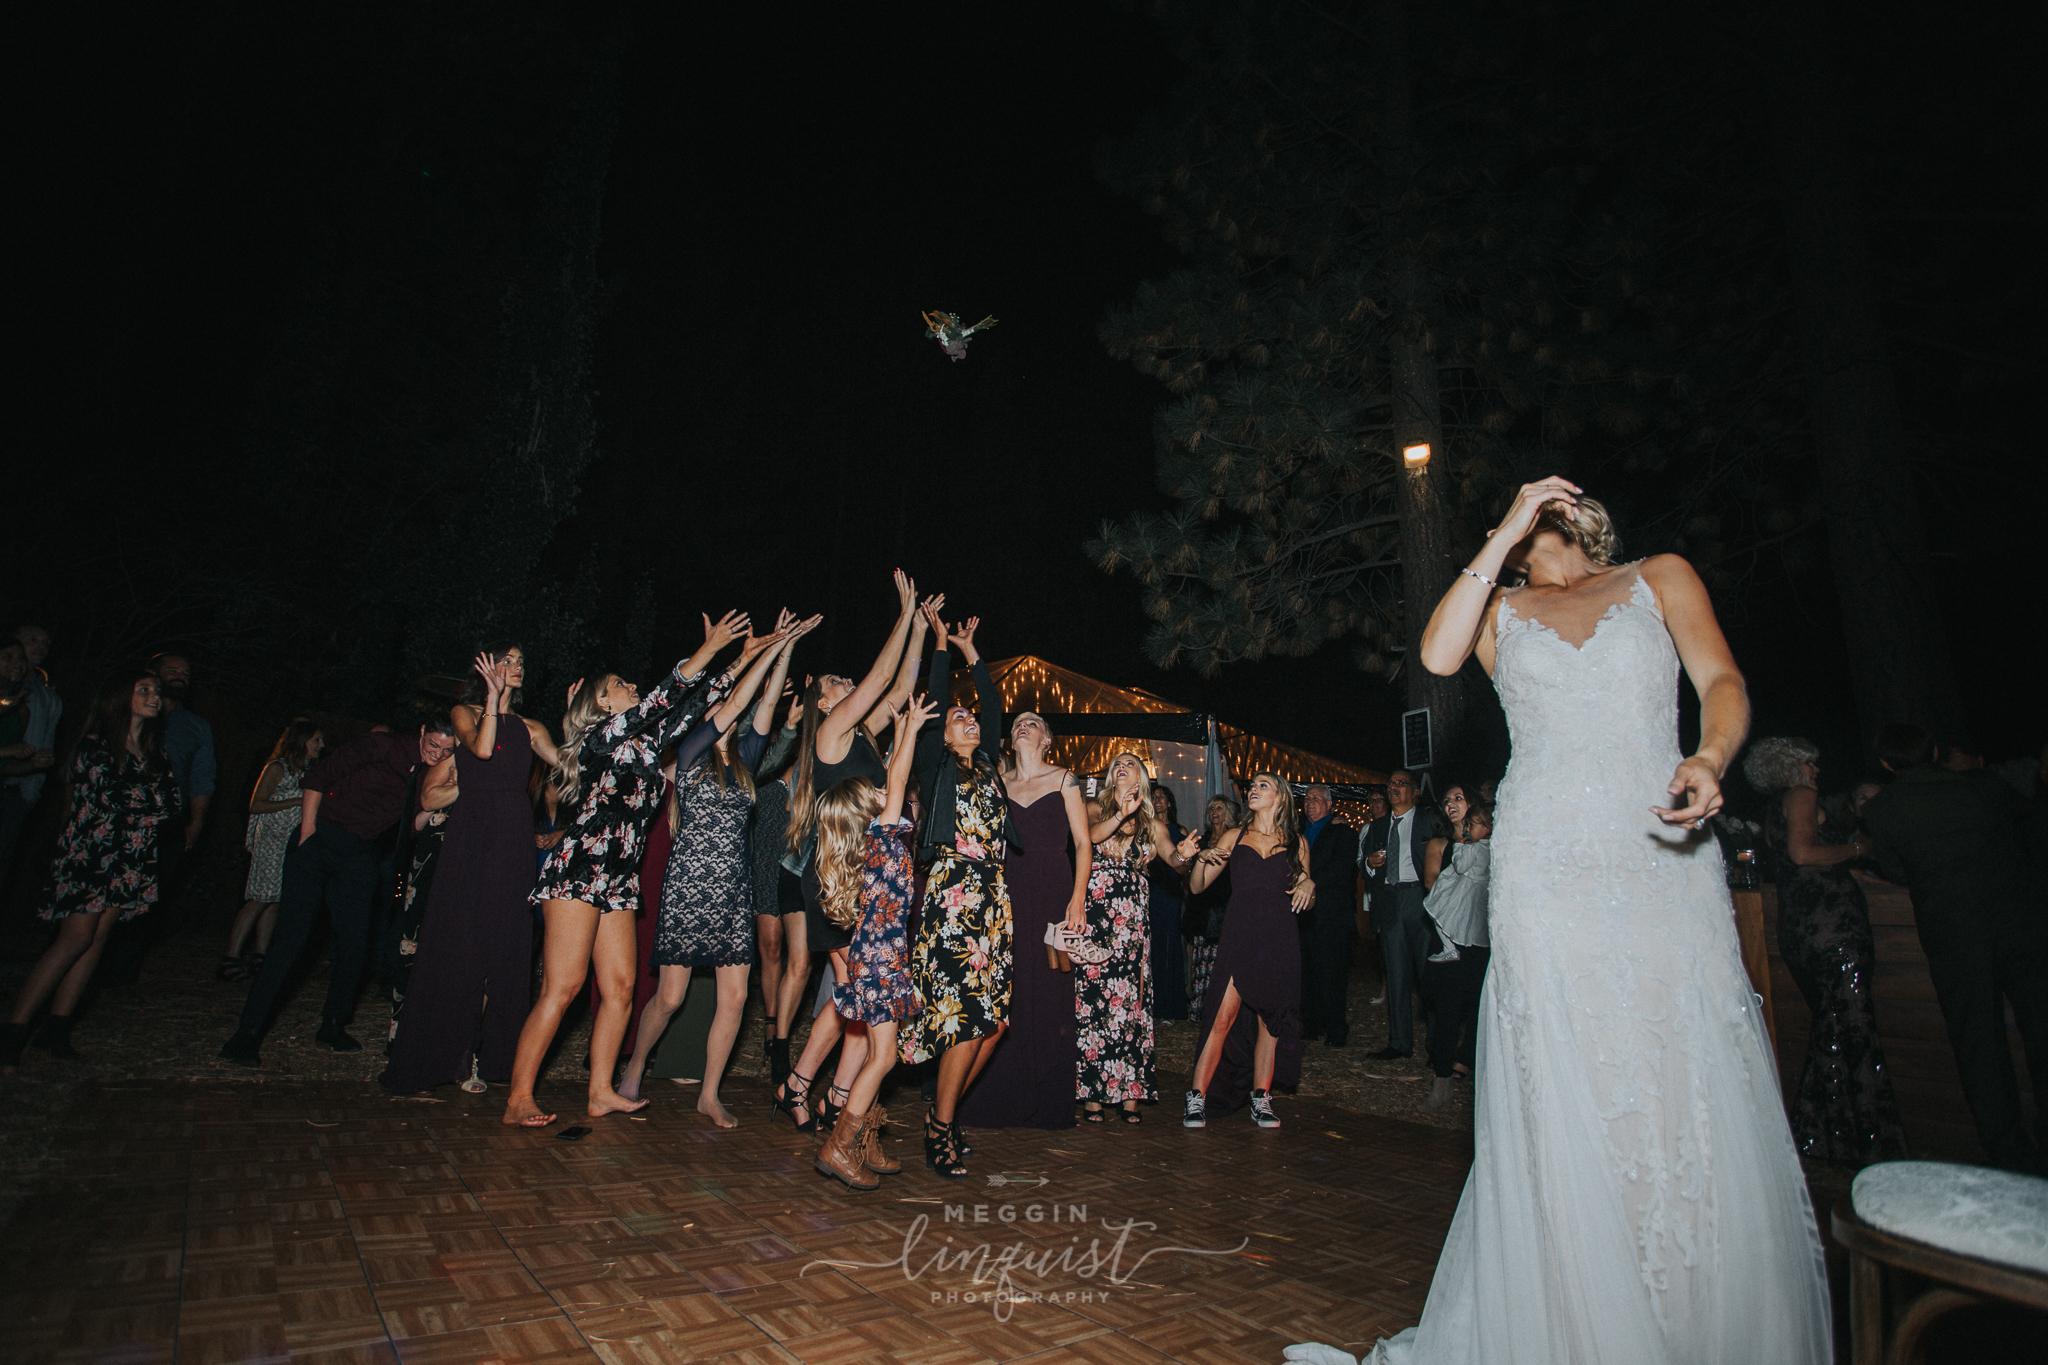 regan-beach-wedding-reno-lake-tahoe-wedding-photographer-78.jpg